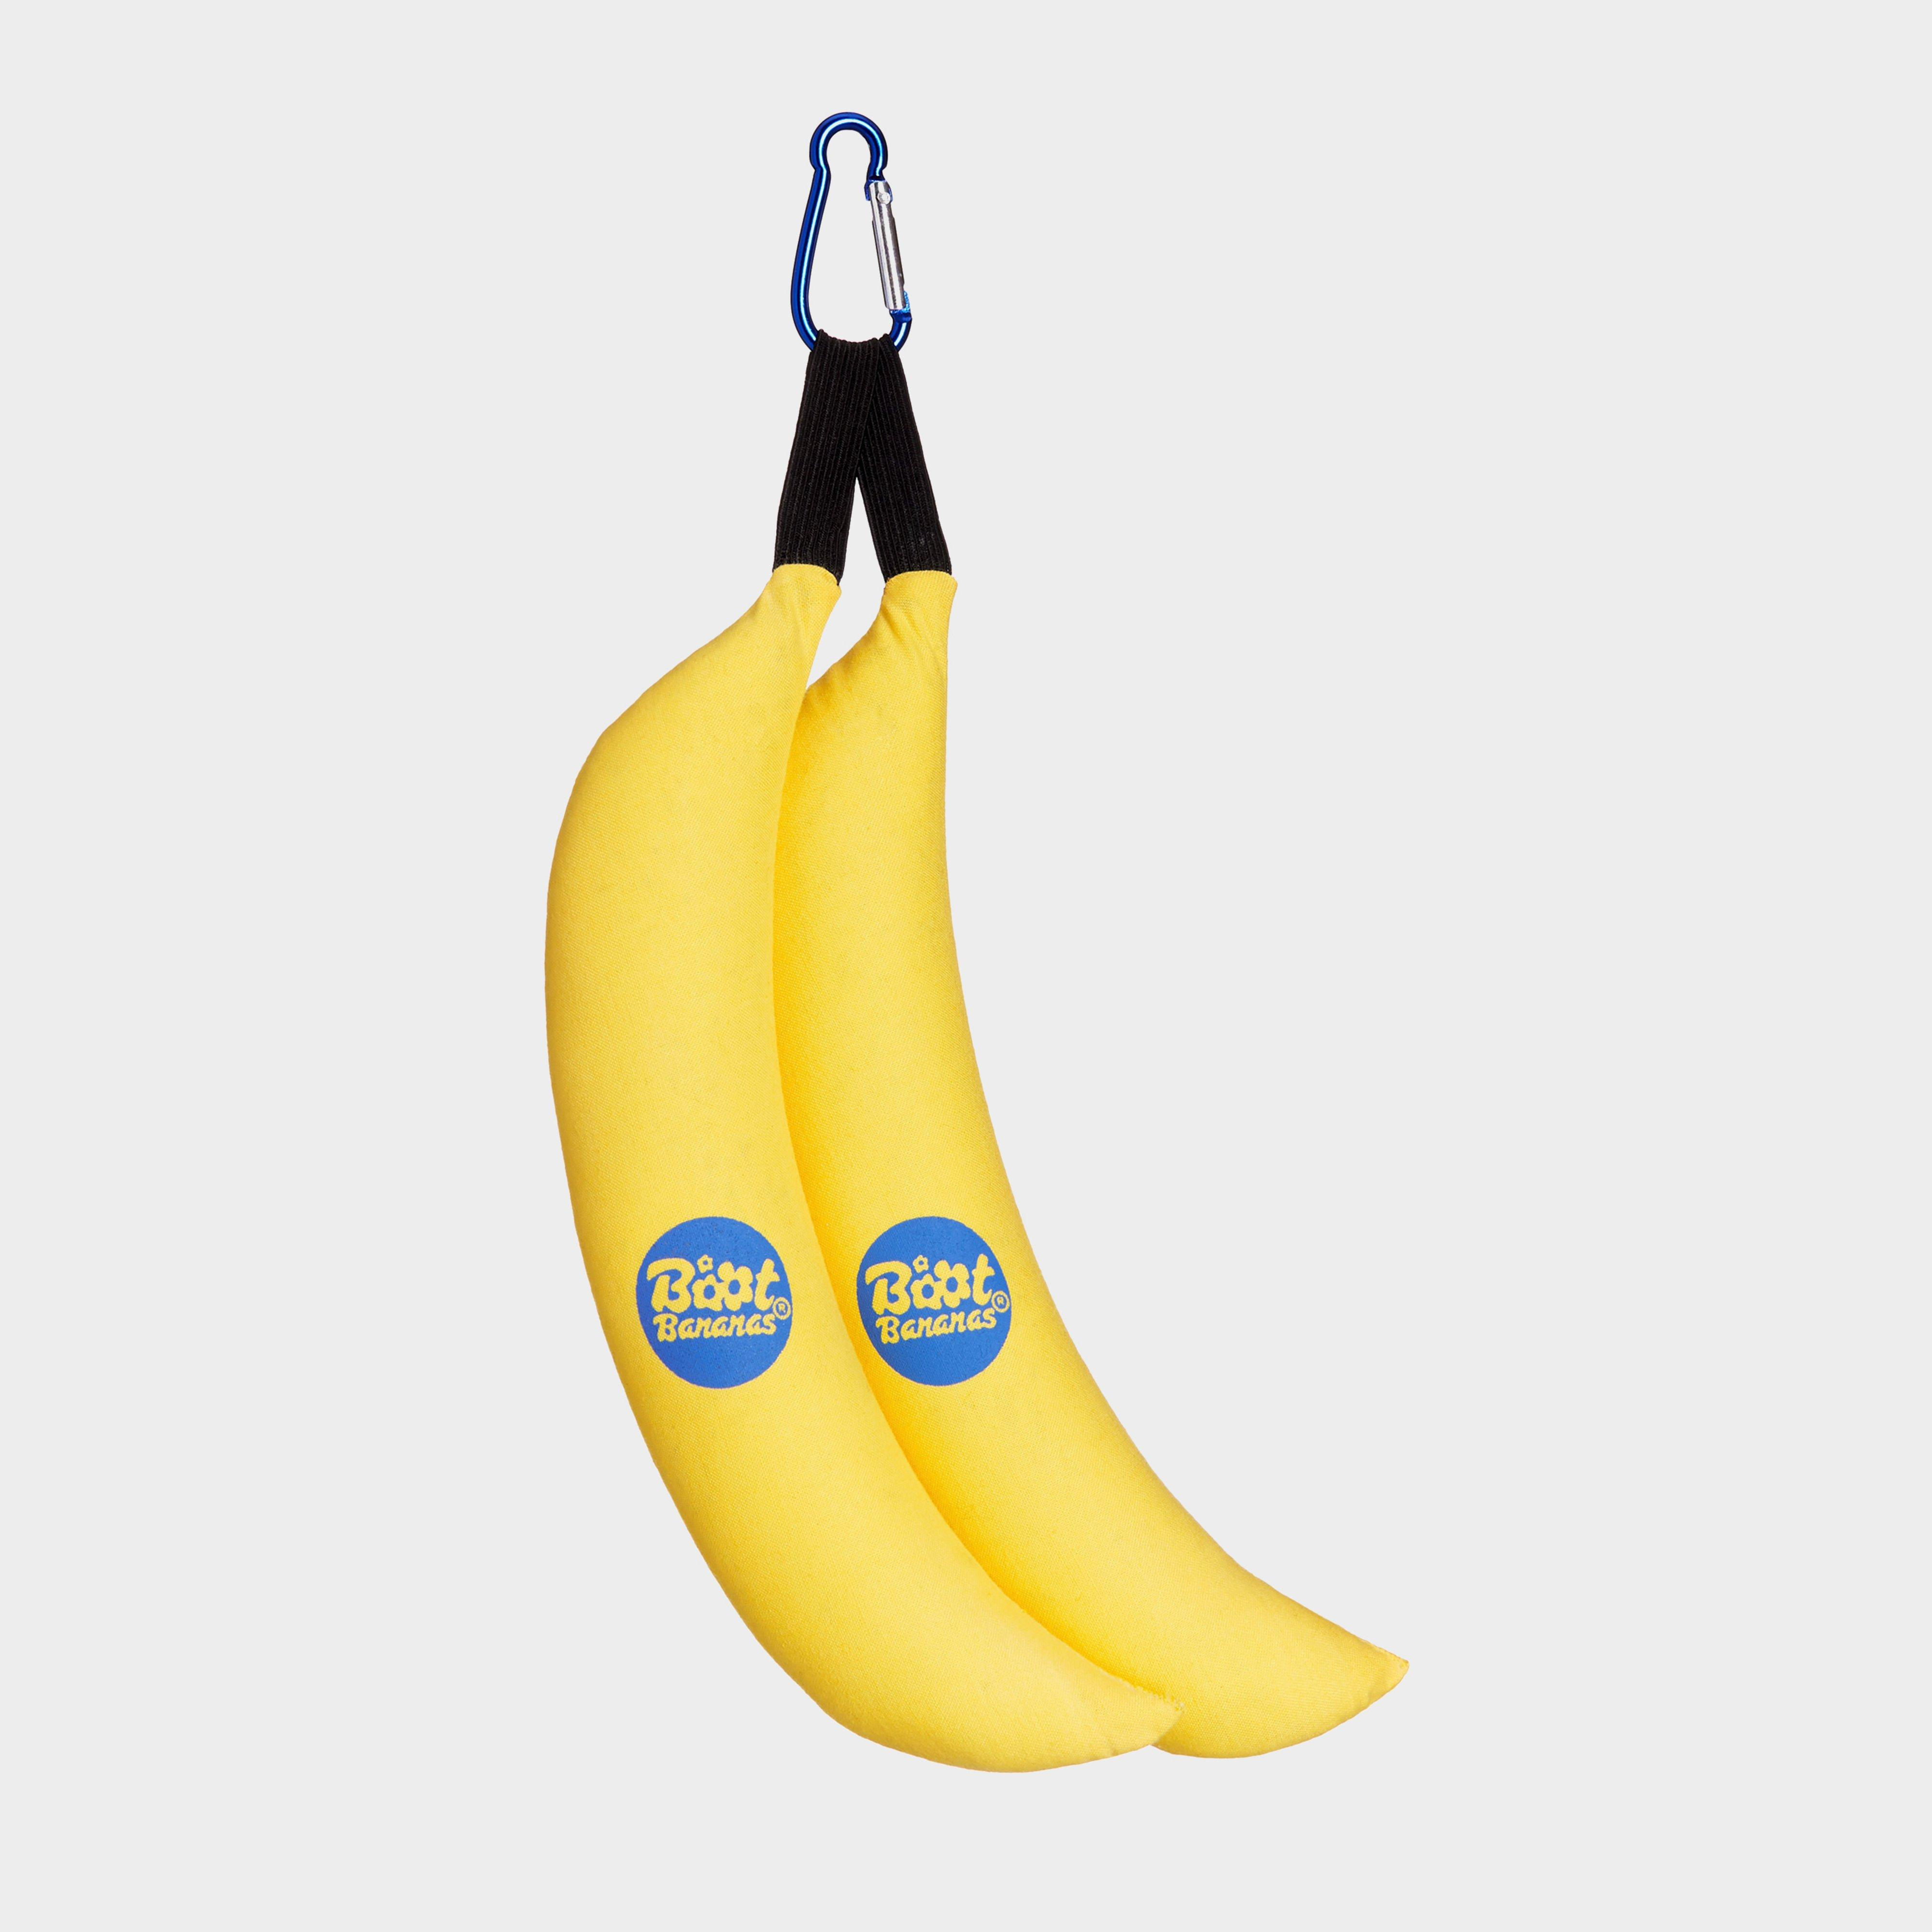 Boot Bananas Boot - Banana/banana  Banana/banana